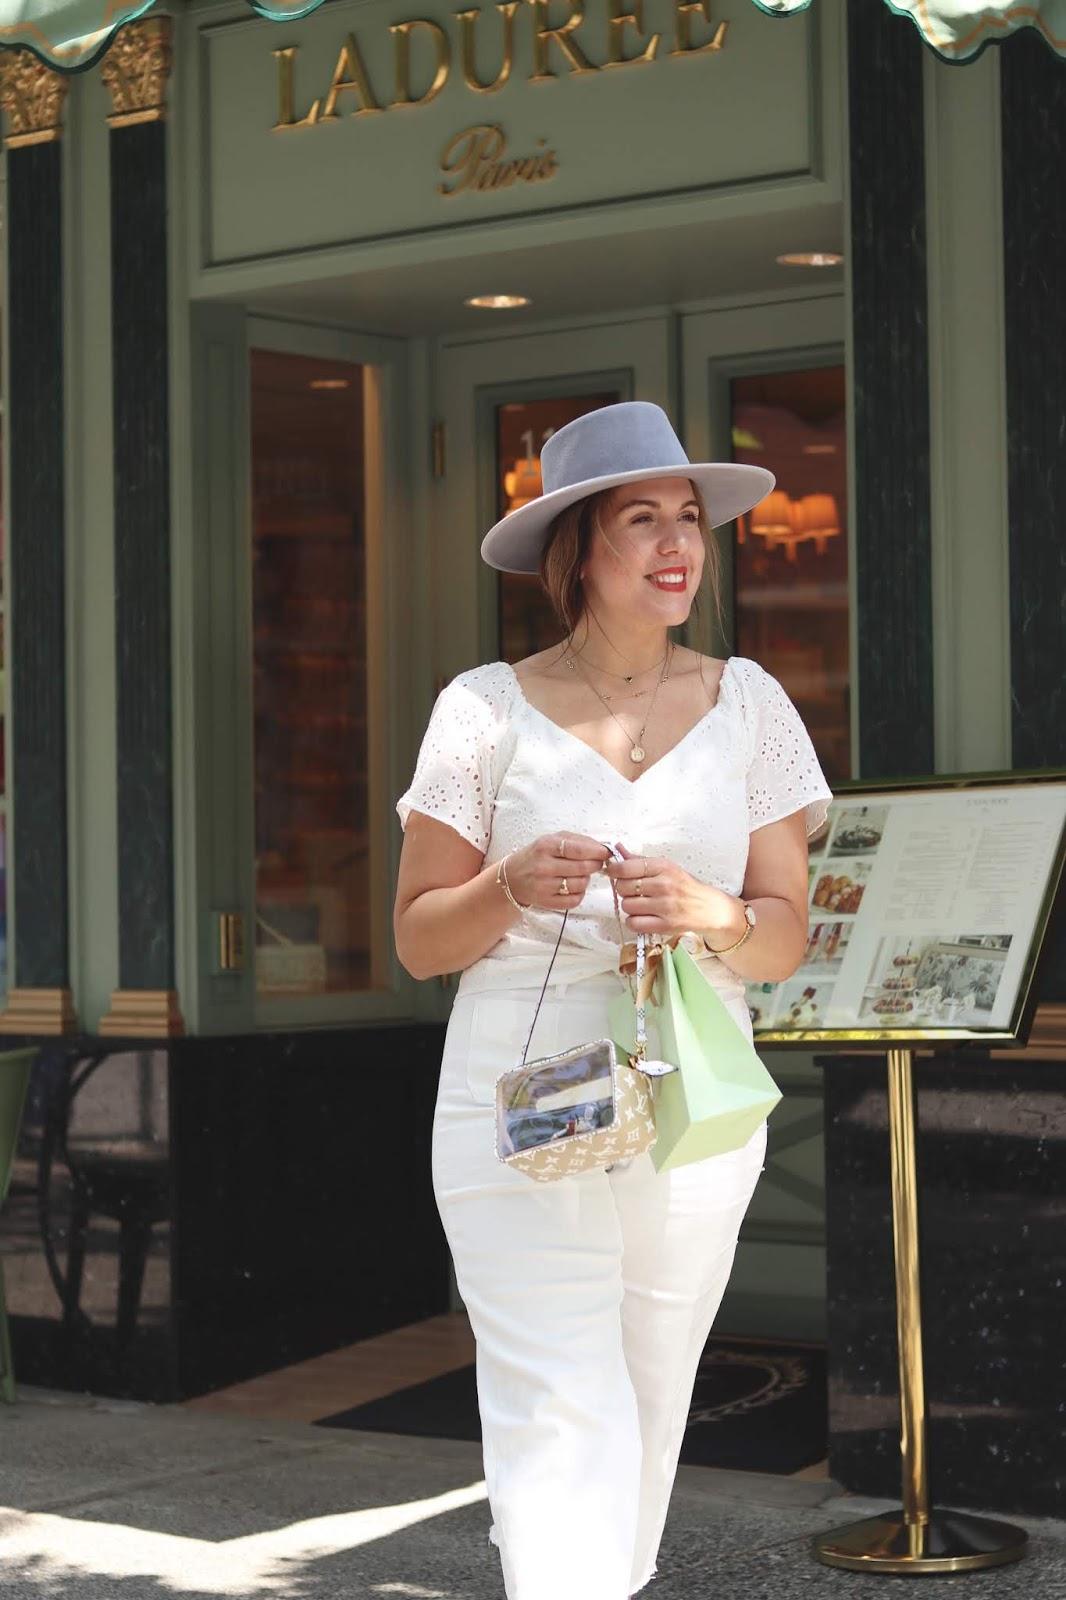 All white outfit idea le chateau cotton top vancouver laduree blogger heirloom hat louis vuitton beach bag aleesha harris